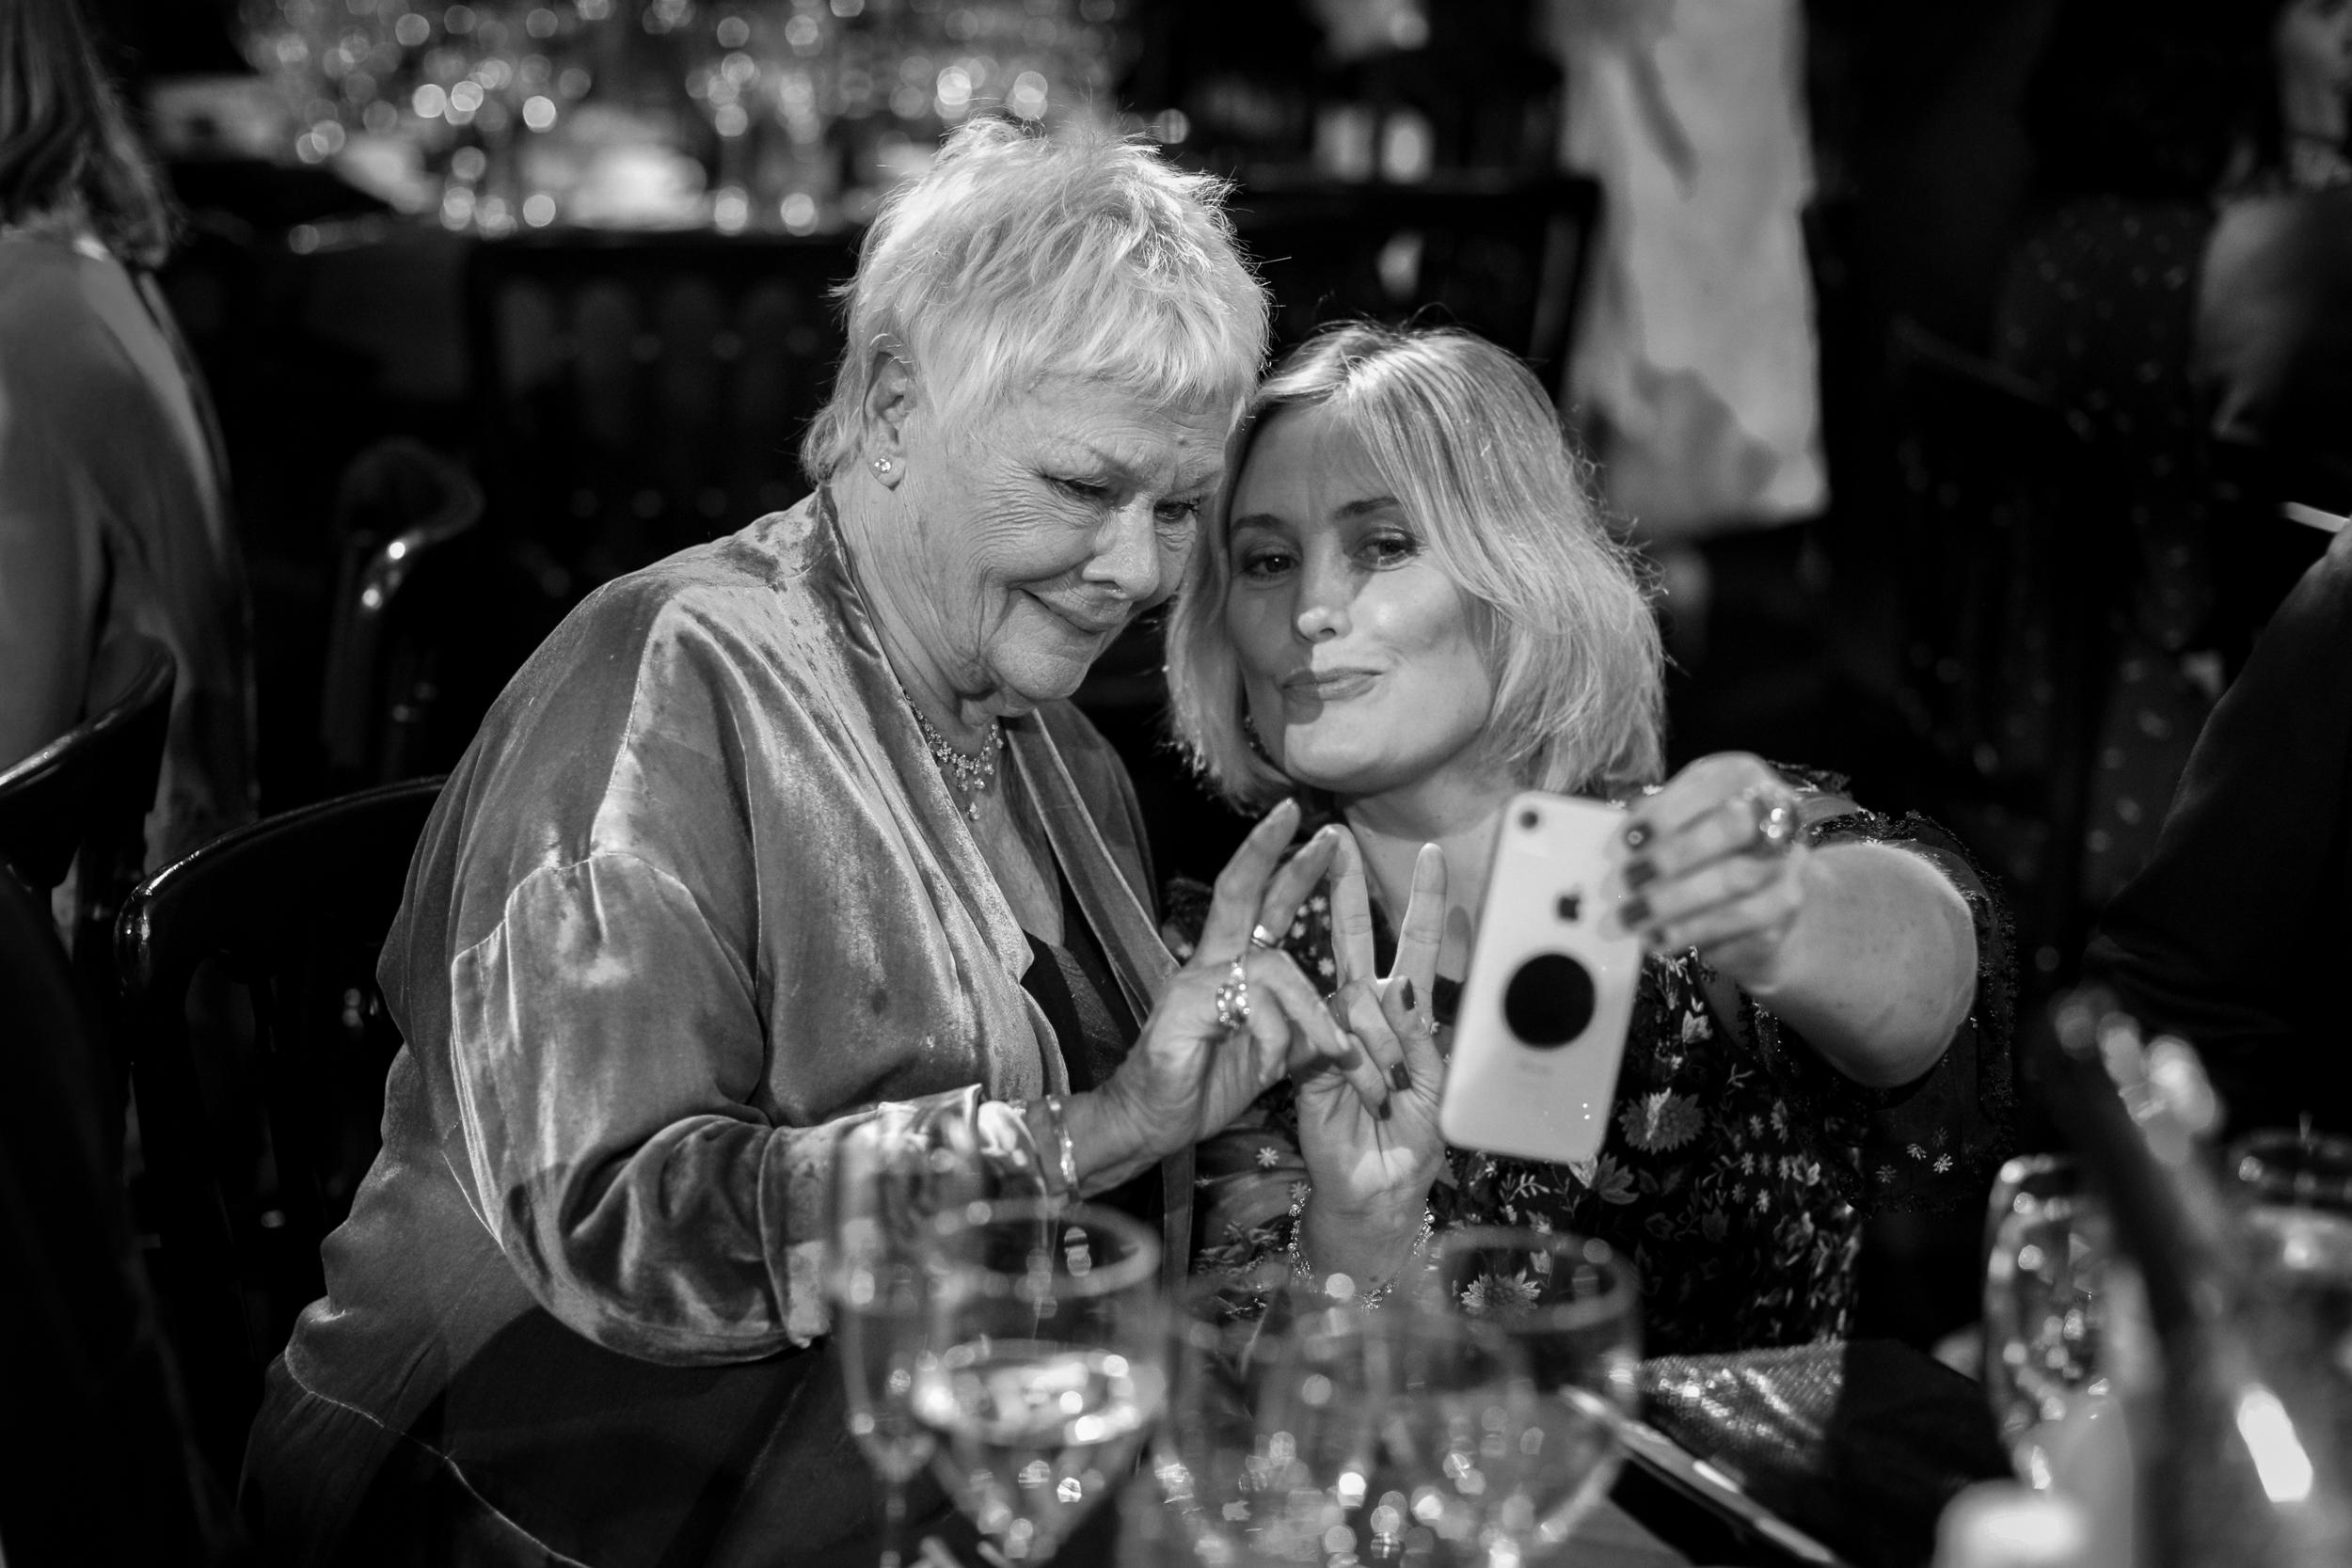 Judi Dench takes a selfie at the 2018 British Independent Film Awards at Old Billingsgate. December 2018 - London, UK.